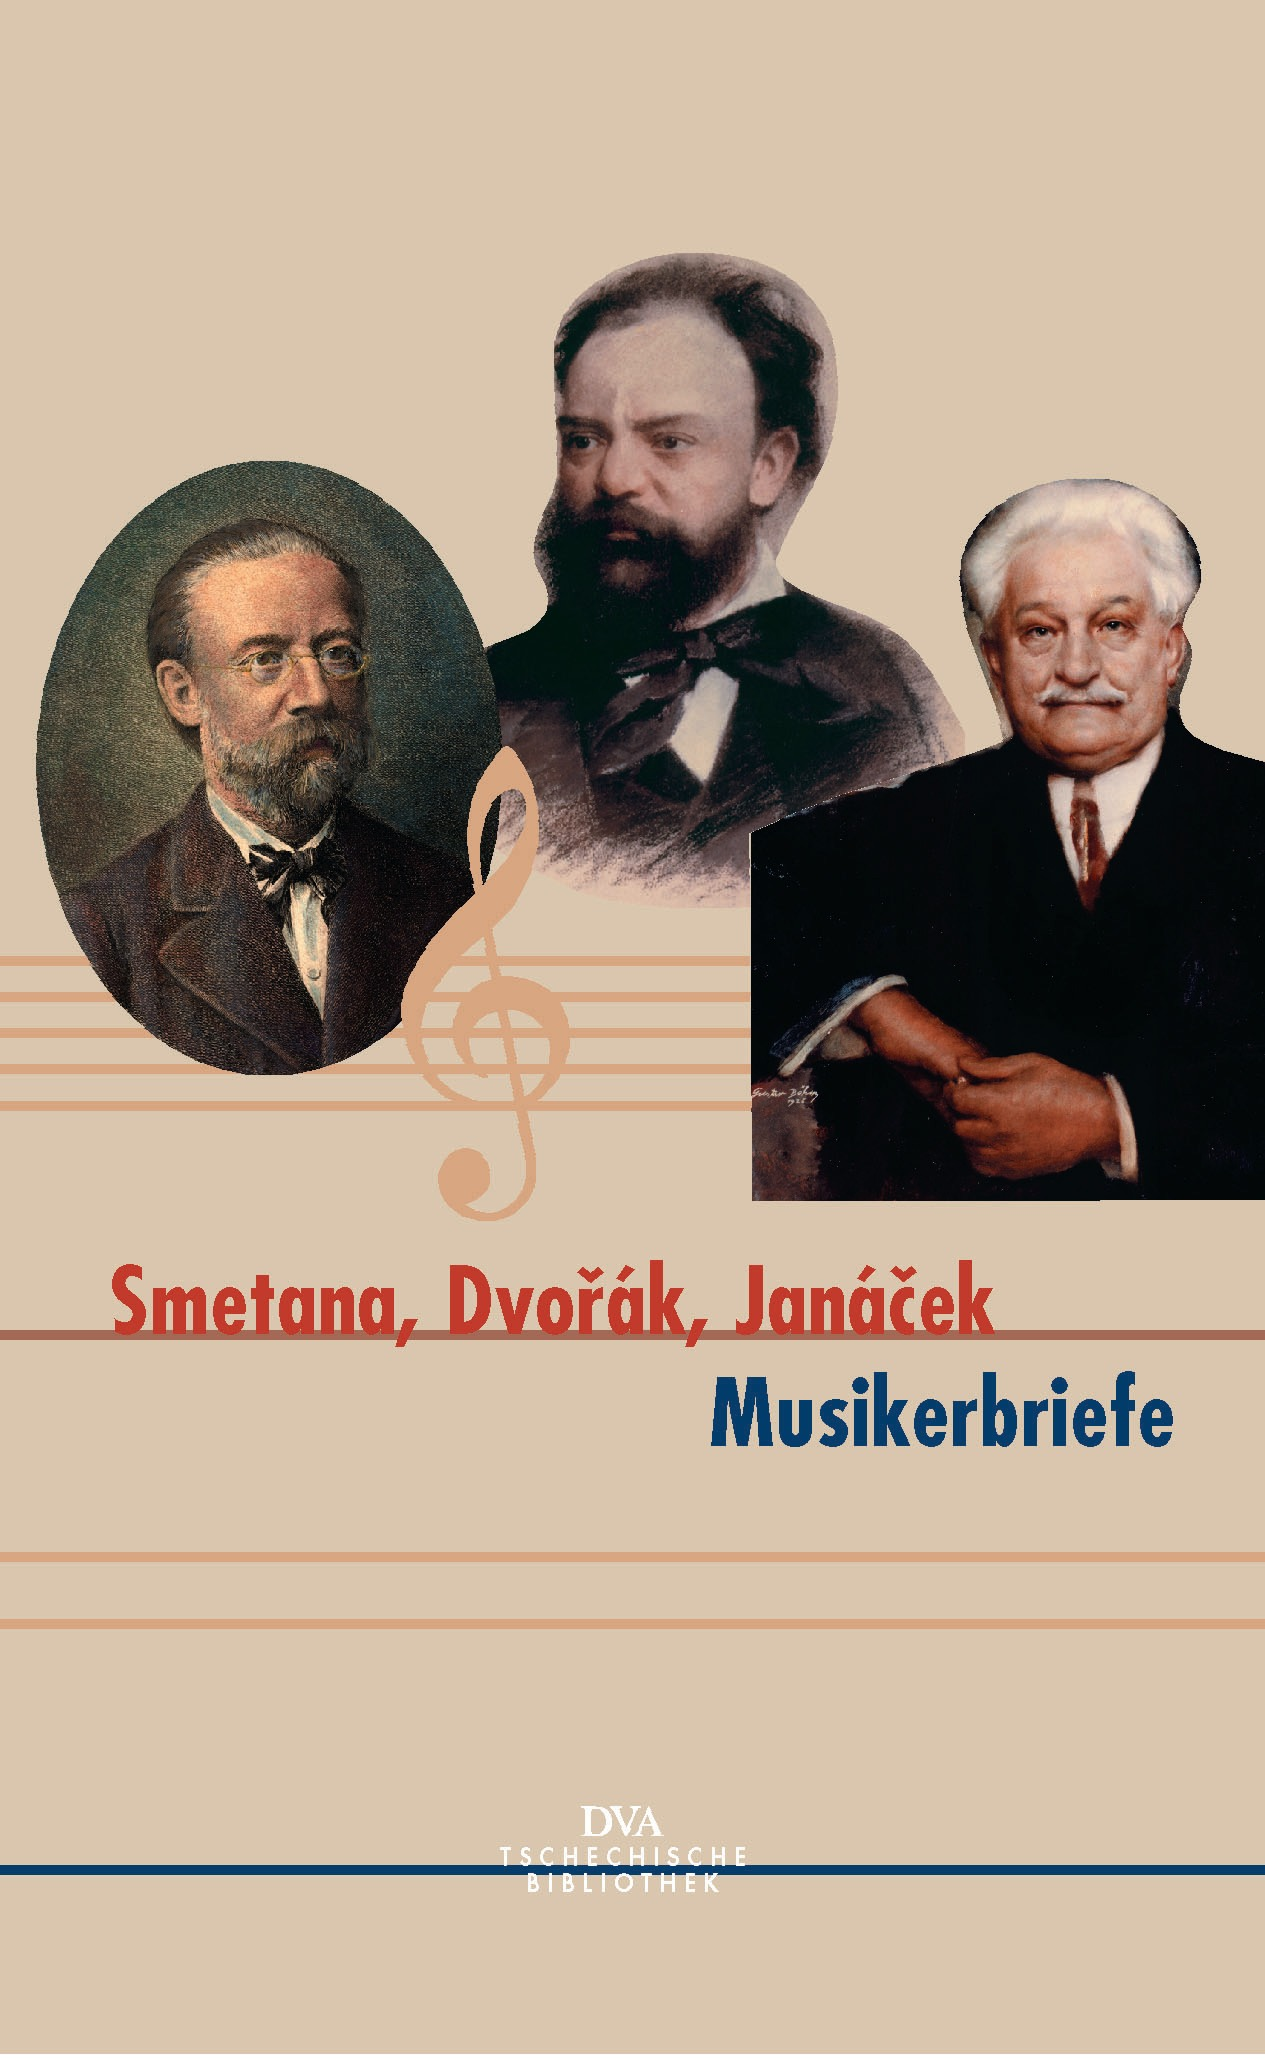 Smetana, Dvorak, Janacek - Musikerbriefe